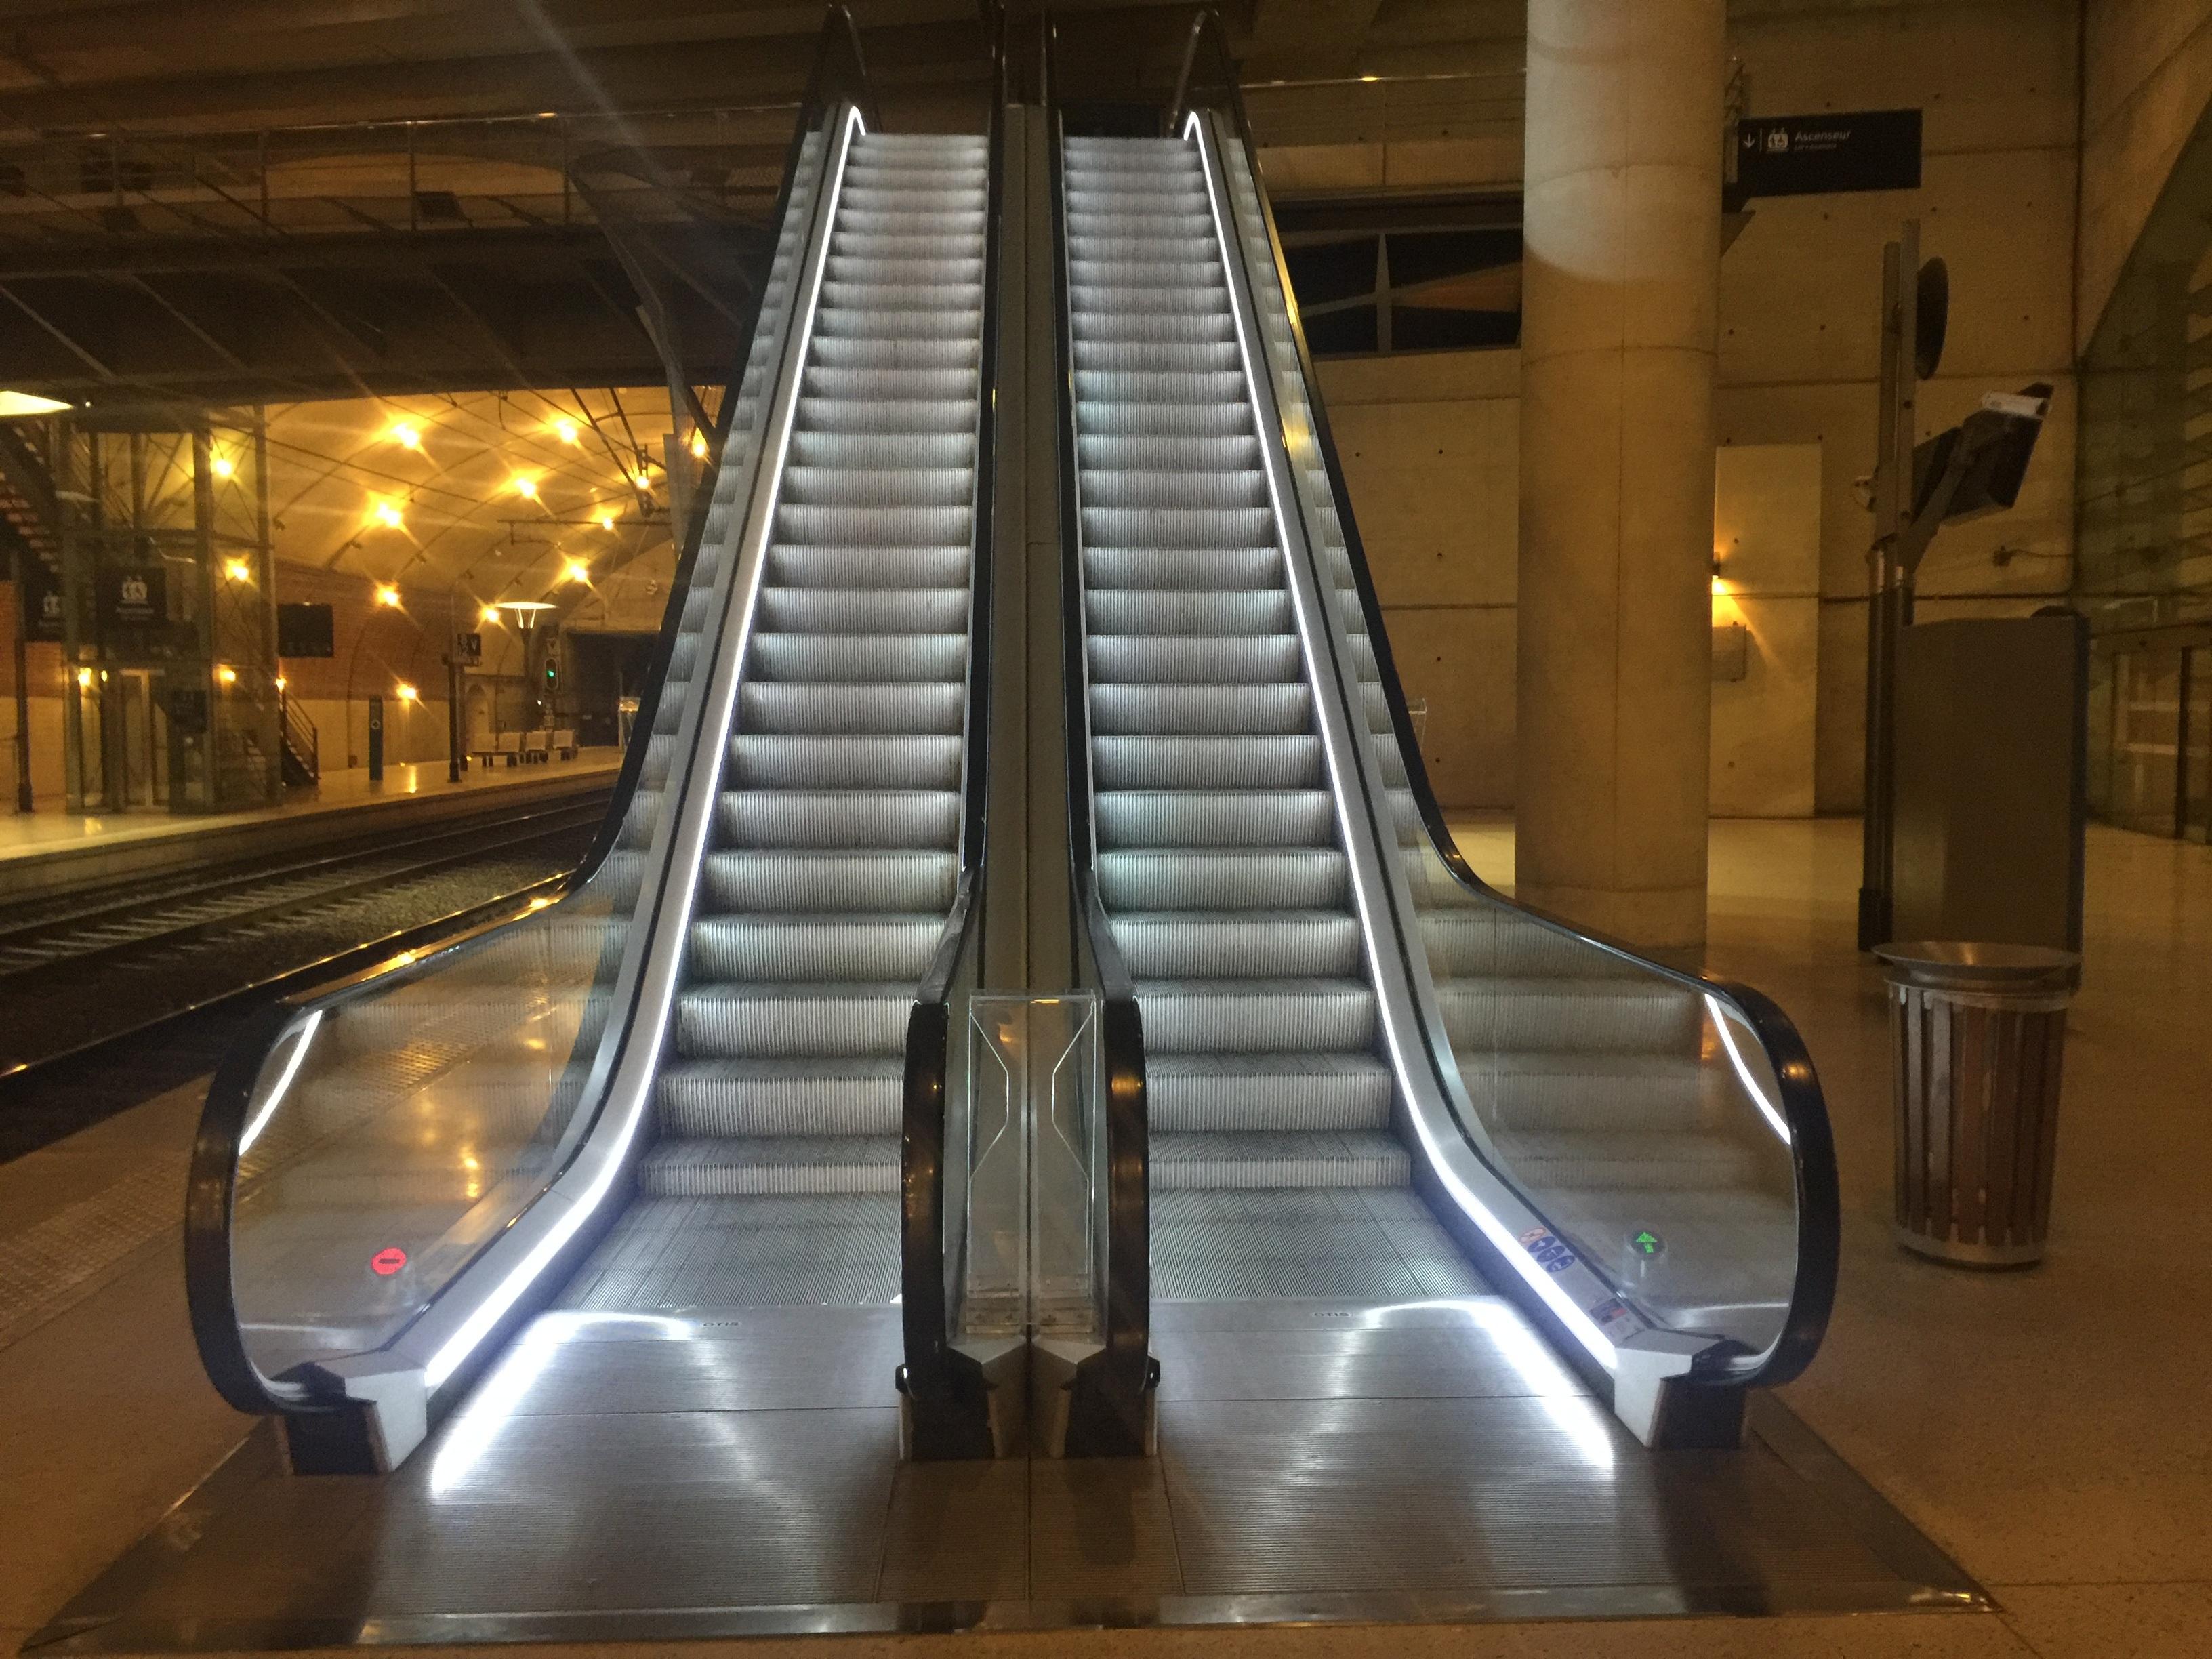 Free Images : light, tunnel, travel, escalator, underground, train ...